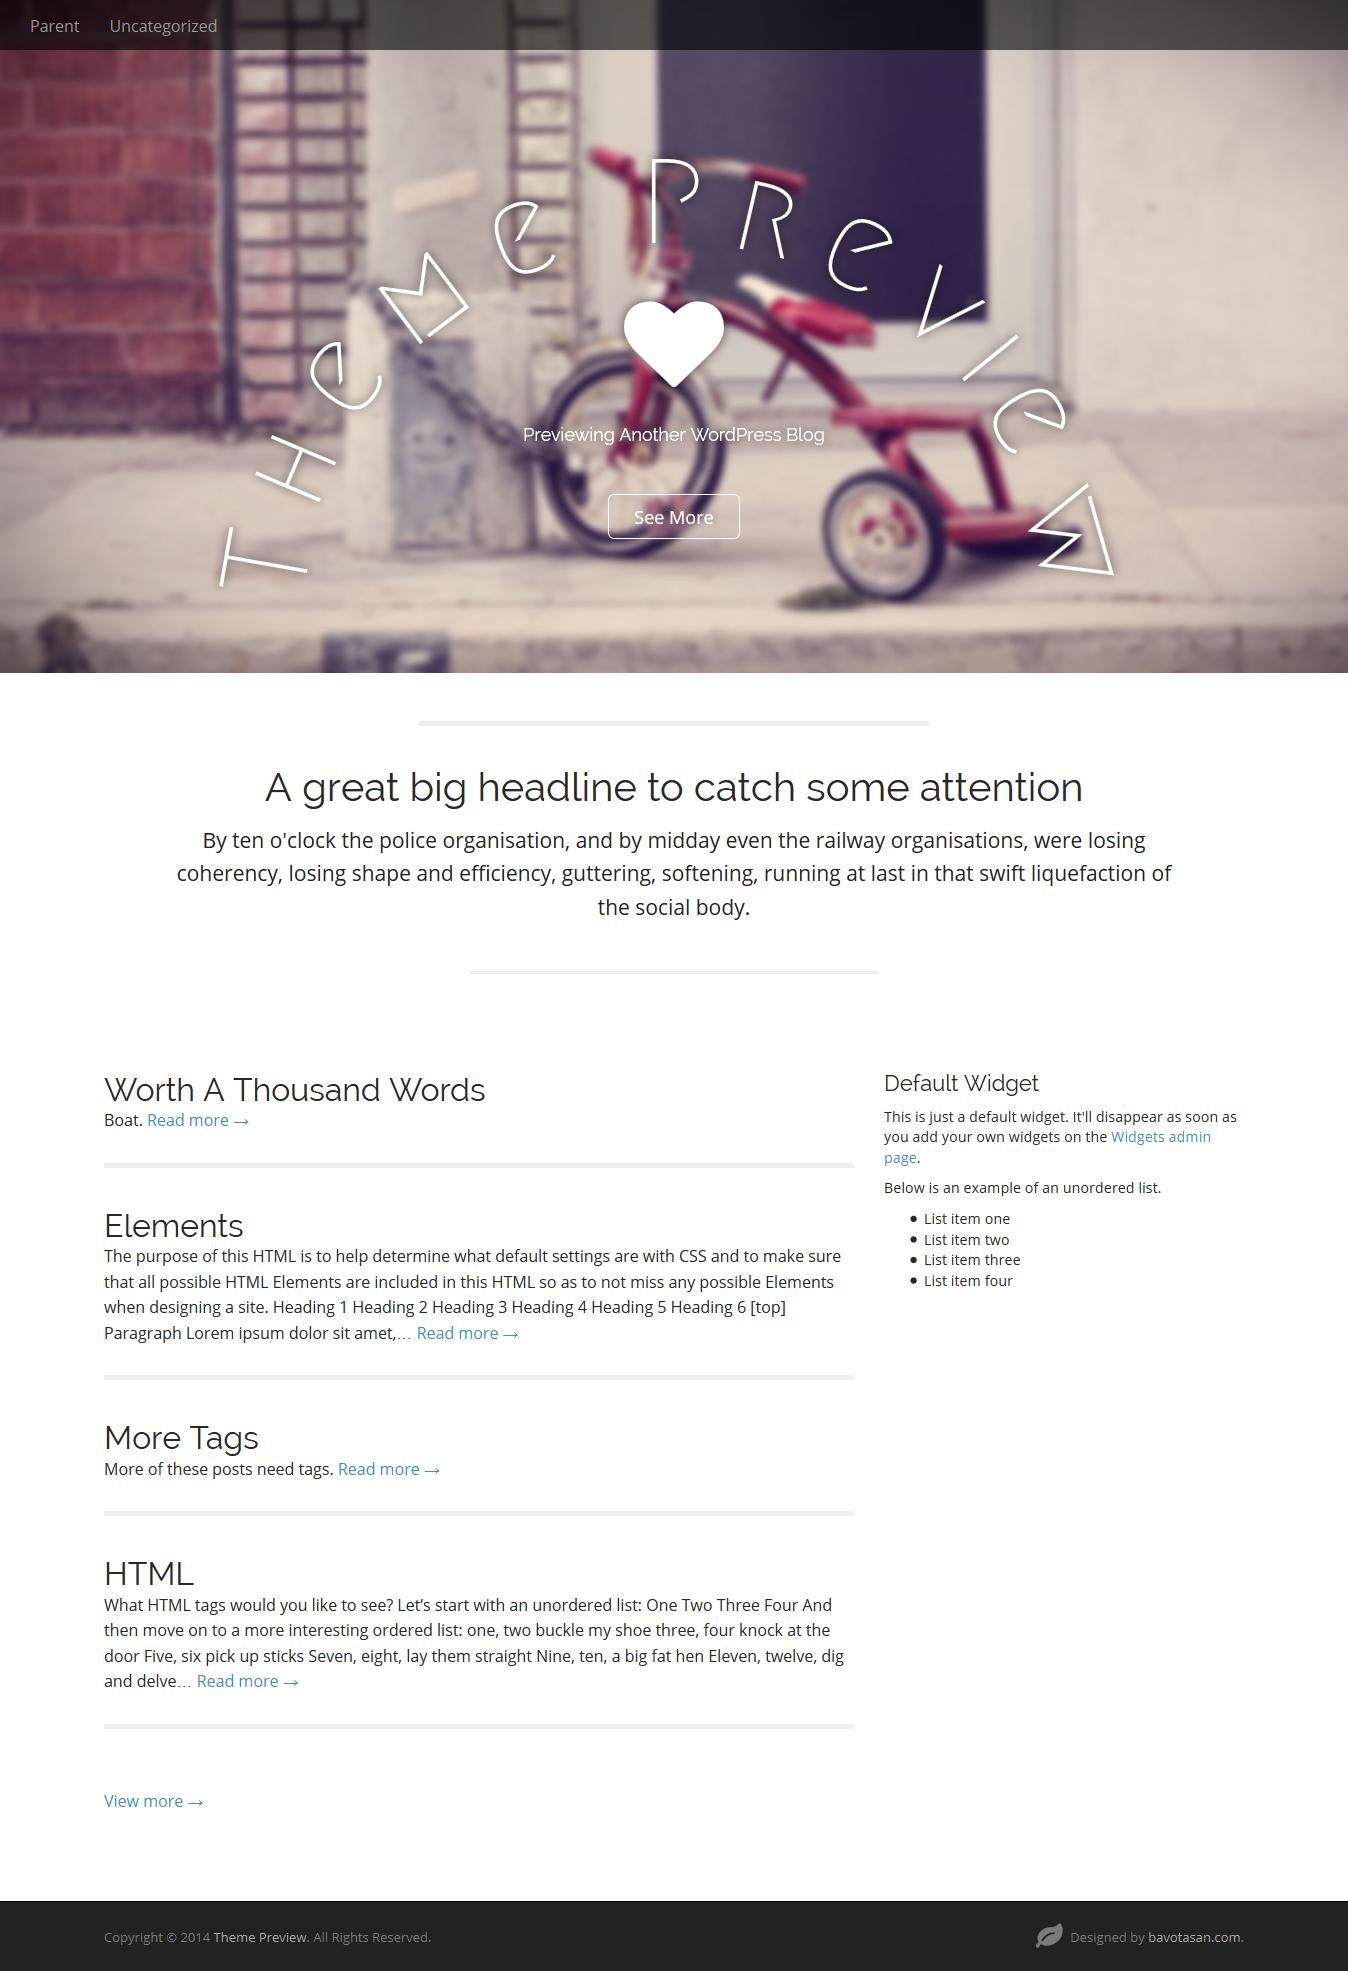 A freemium realy cool #Wordpress theme Demo: https://wp-themes.com ...